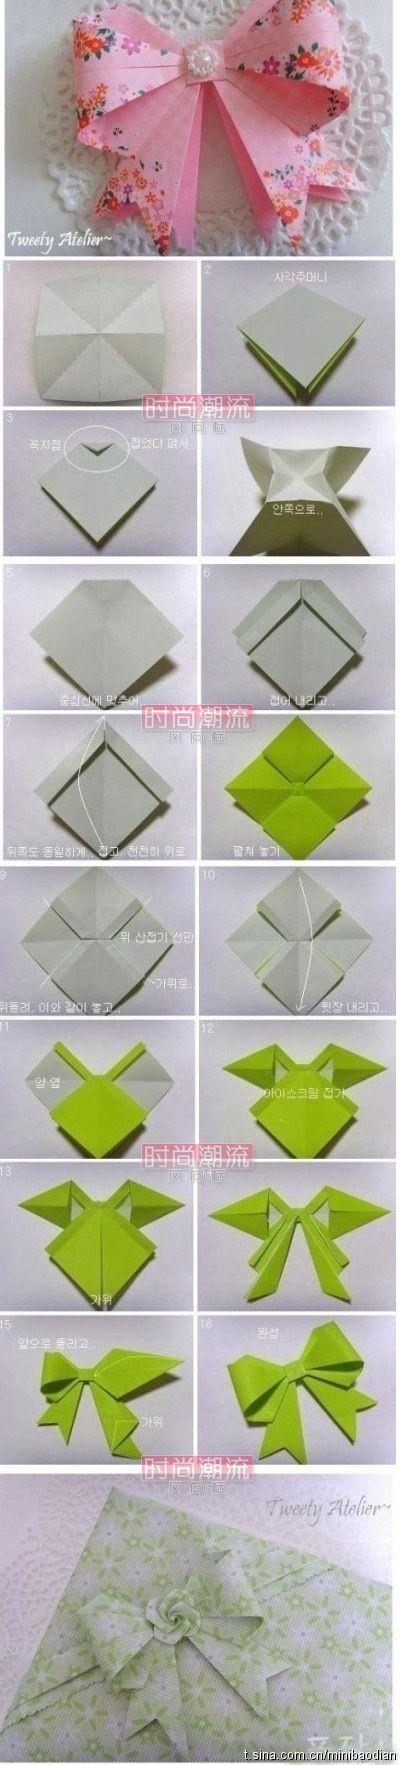 <3Bows Ties, Gift Bows, Bows Tutorials, Origami Paper, Paper Bows, Make A Bows, Gift Wraps, Origami Bows, Crafts